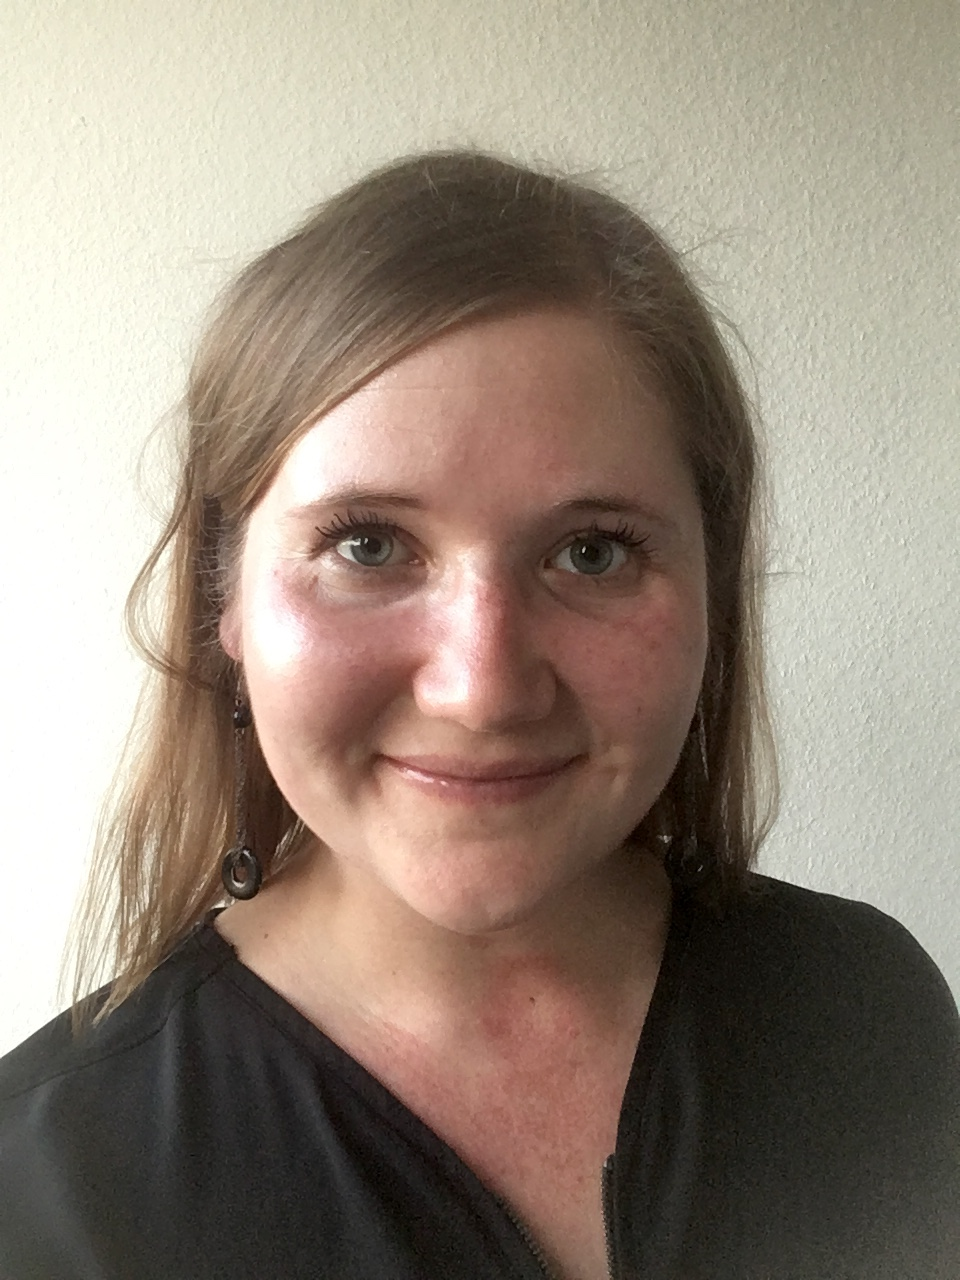 Portrait of Annekatrin Endter